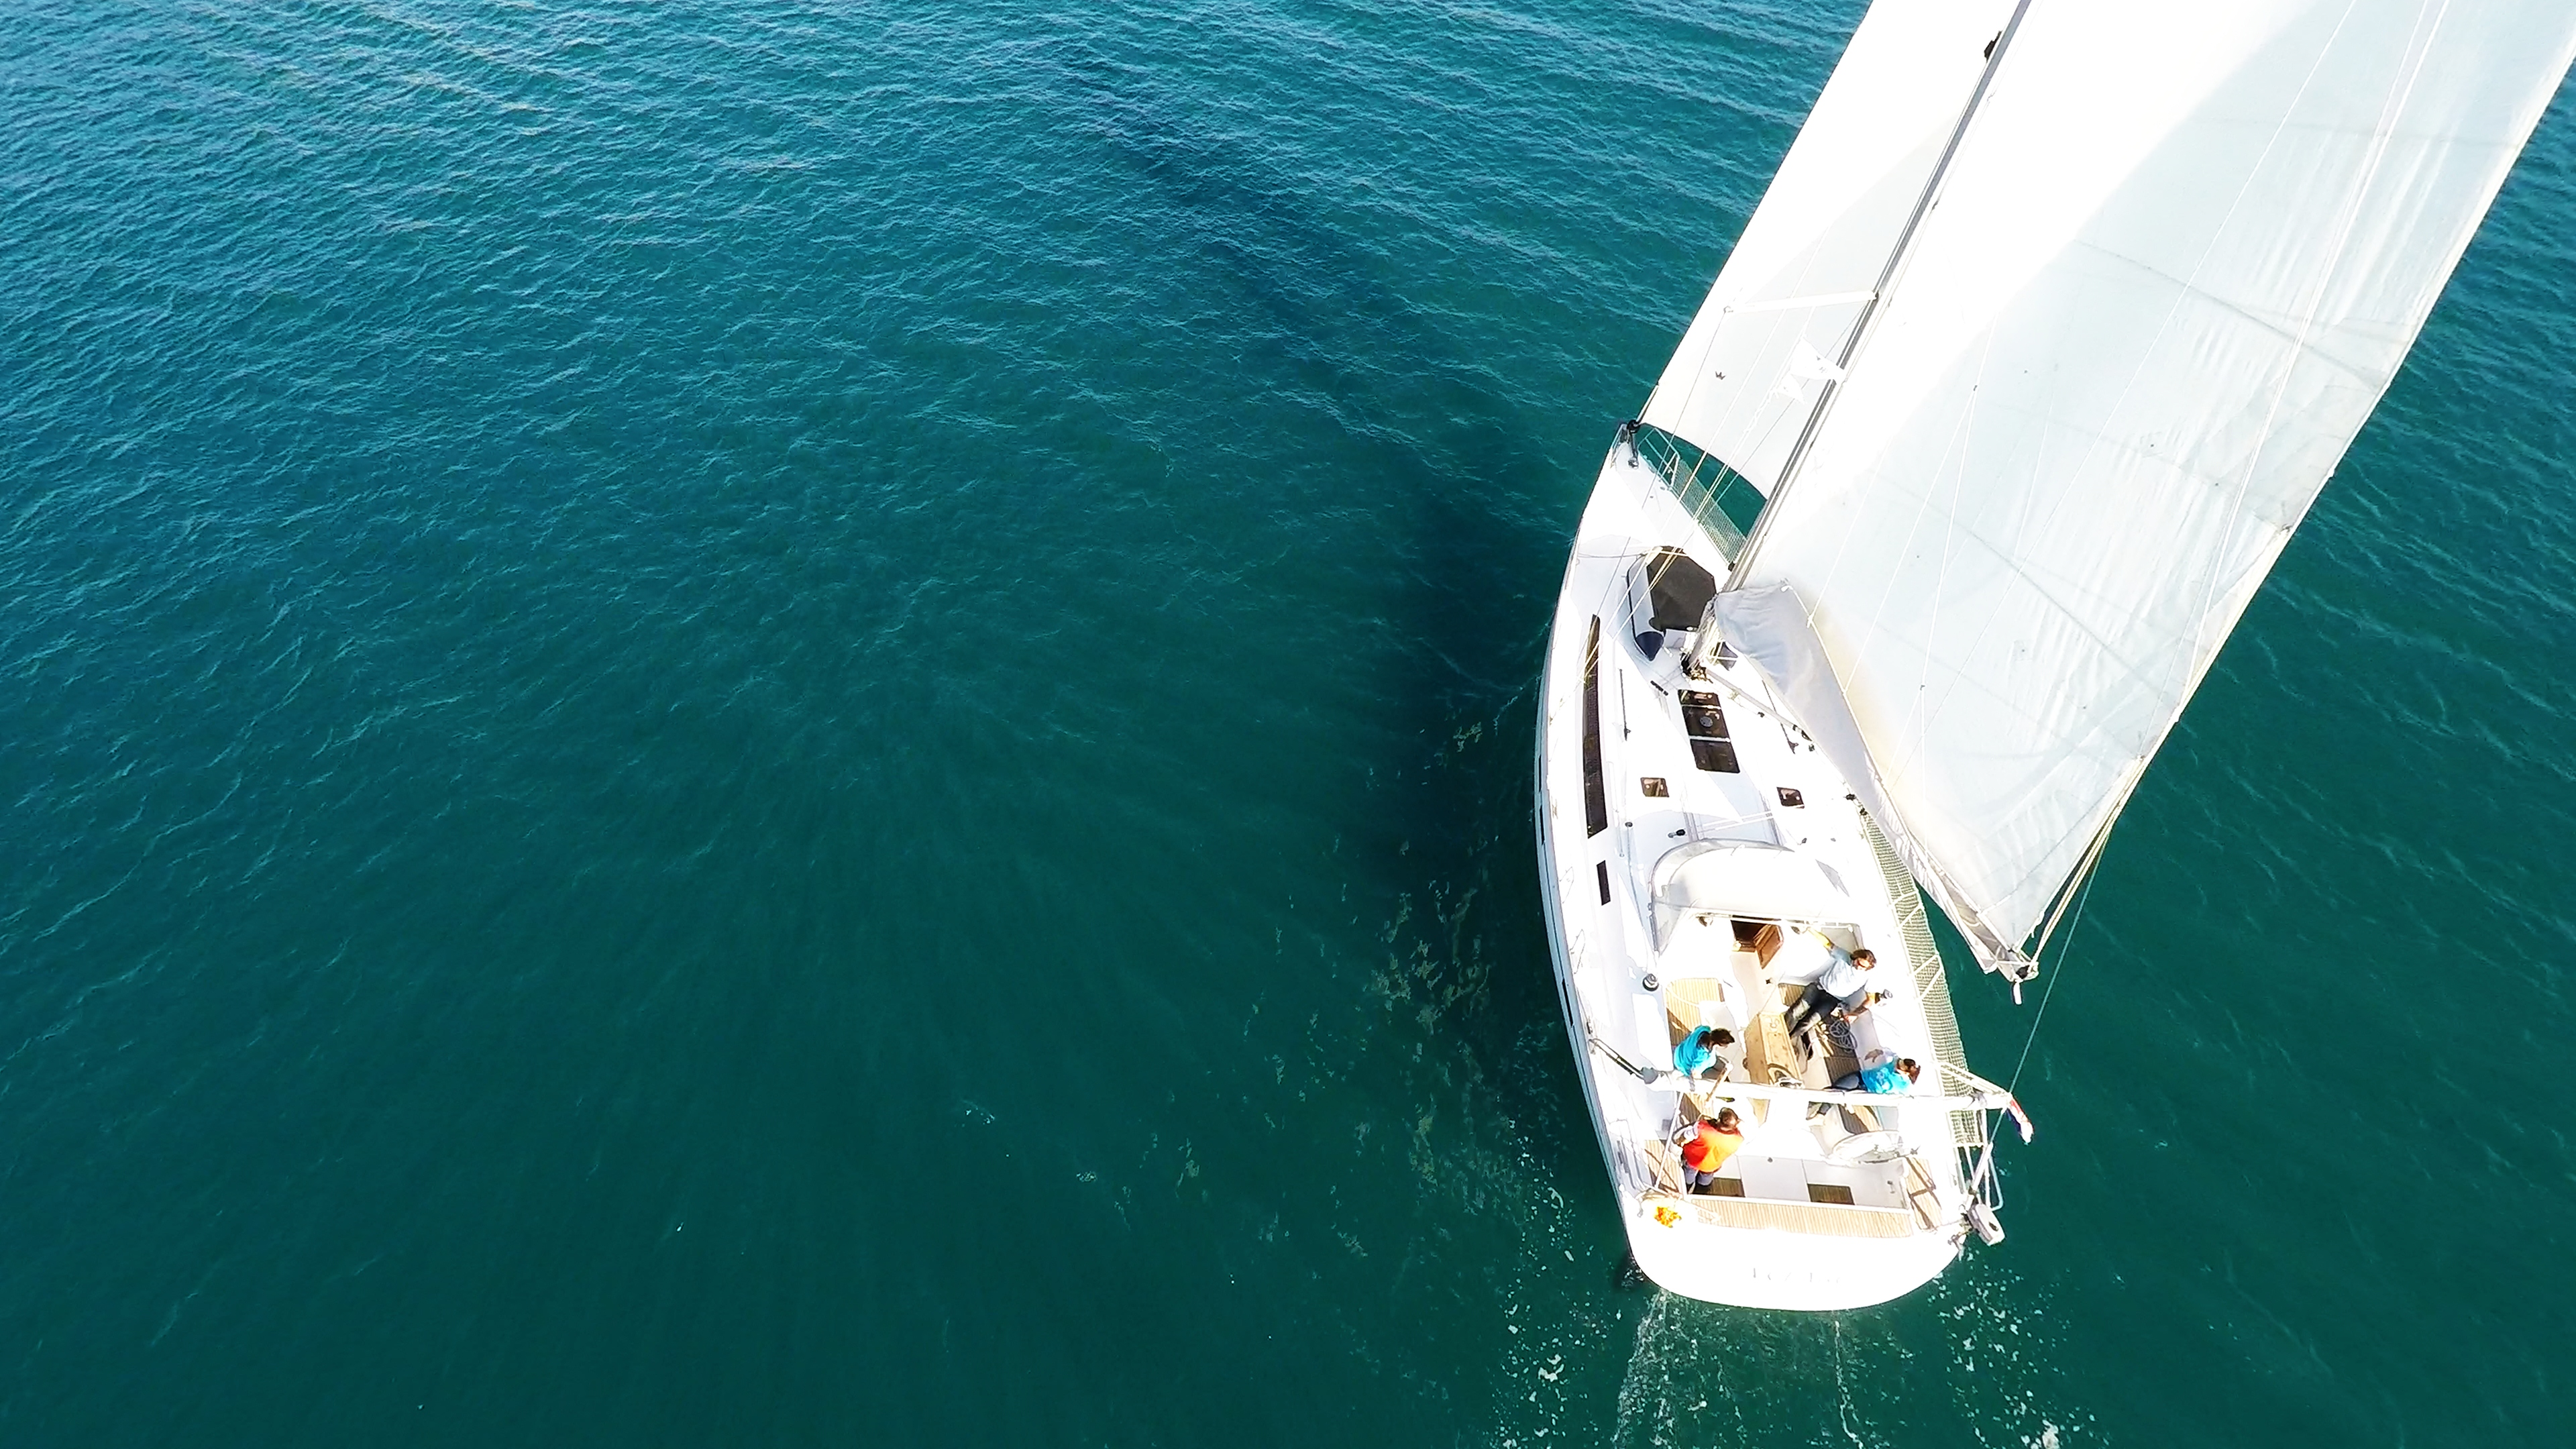 barcha a vela bavaria 46 pozzetto vele yacht a vela randa